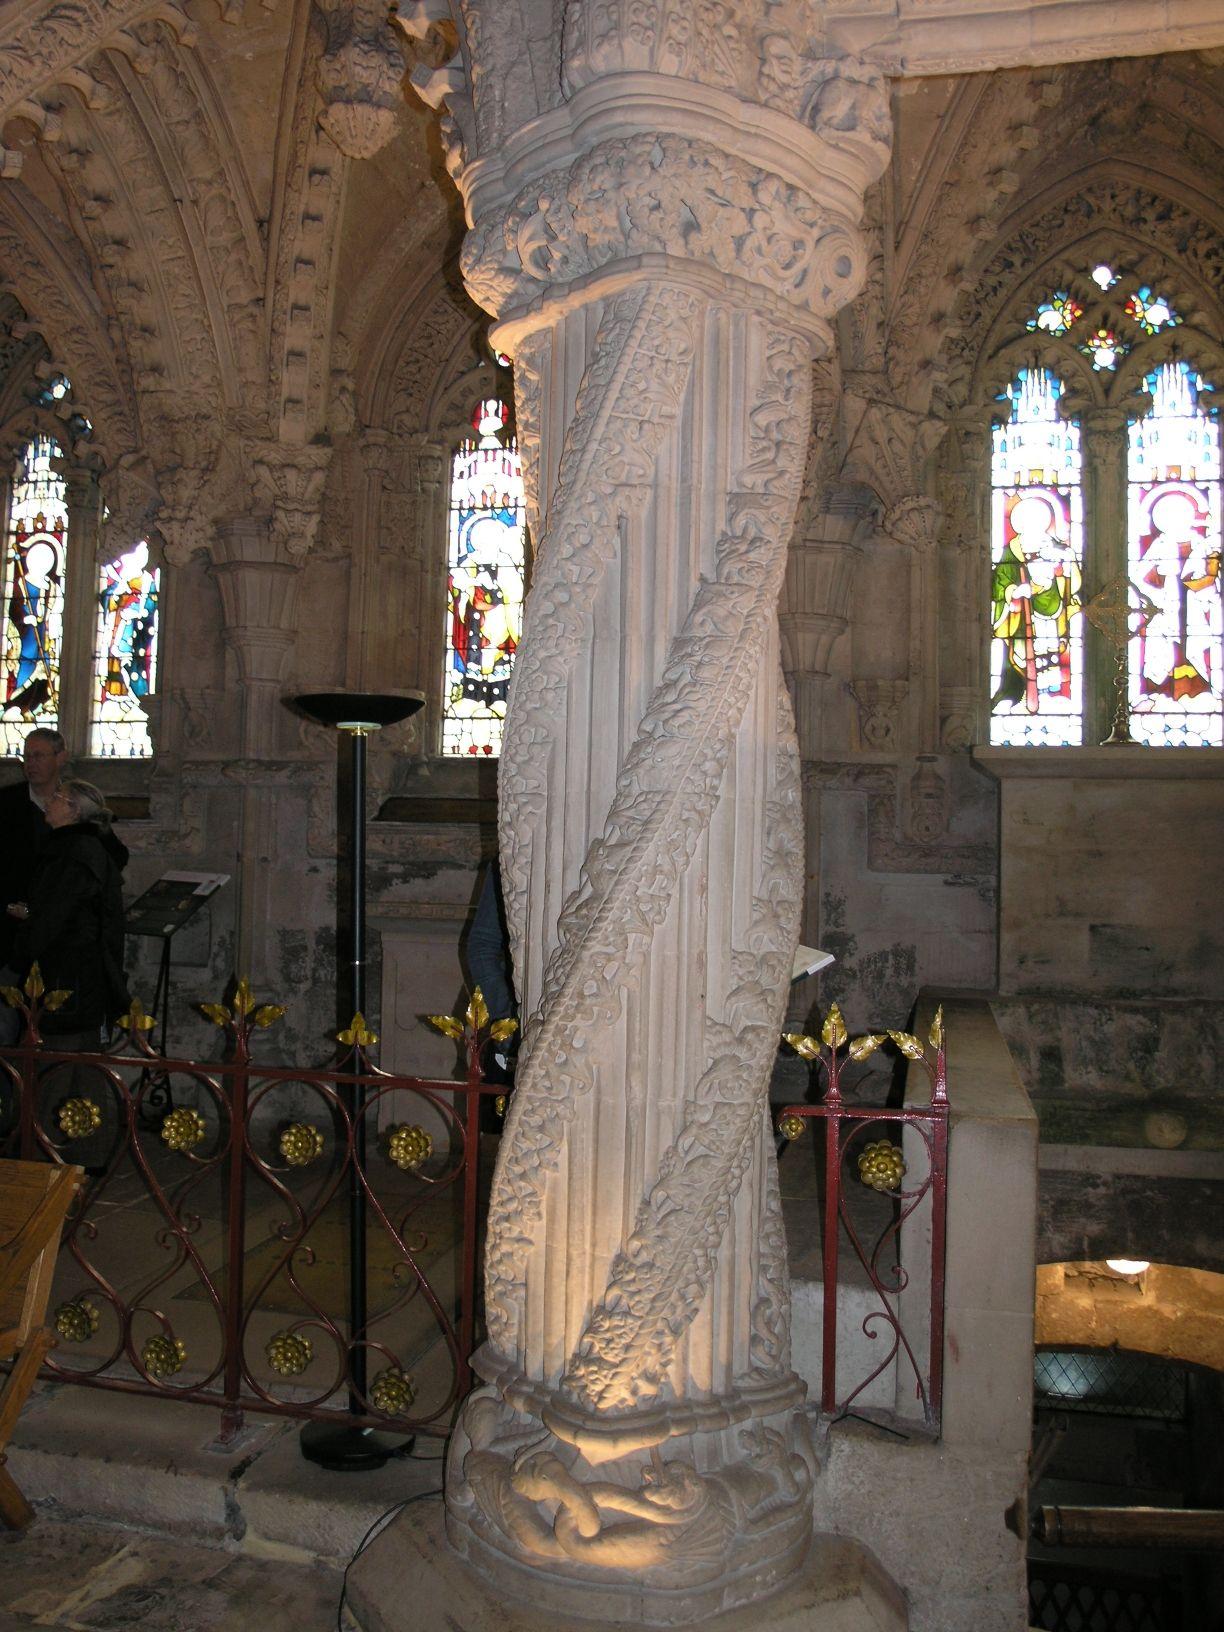 The Apprentice Column, Rosslyn Chapel Pillars & Columns